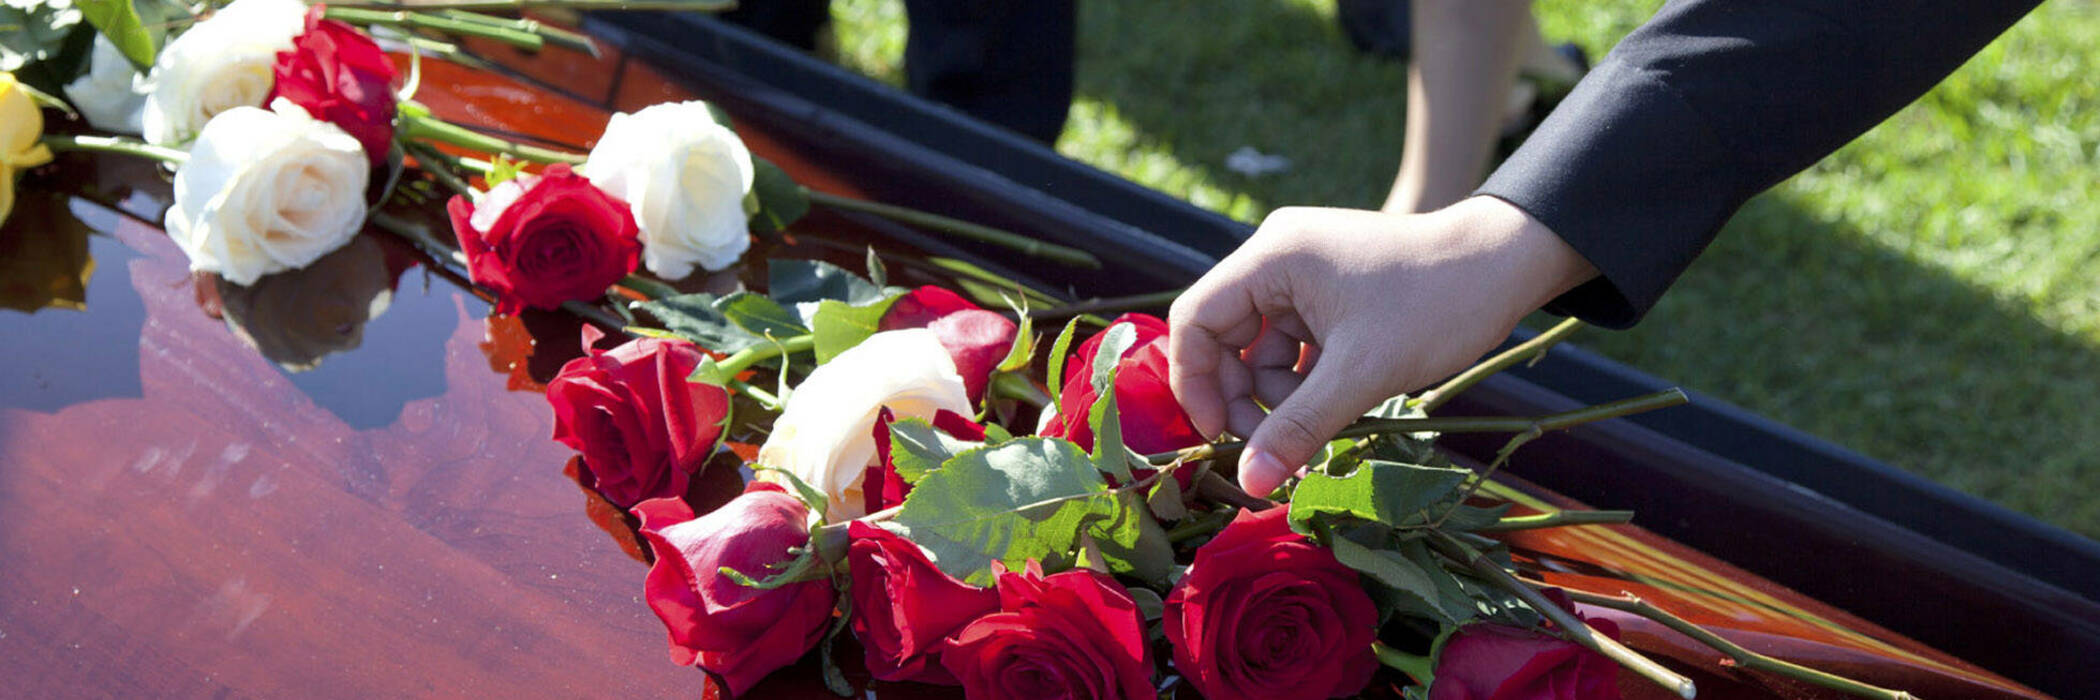 16may funeral insurance hero